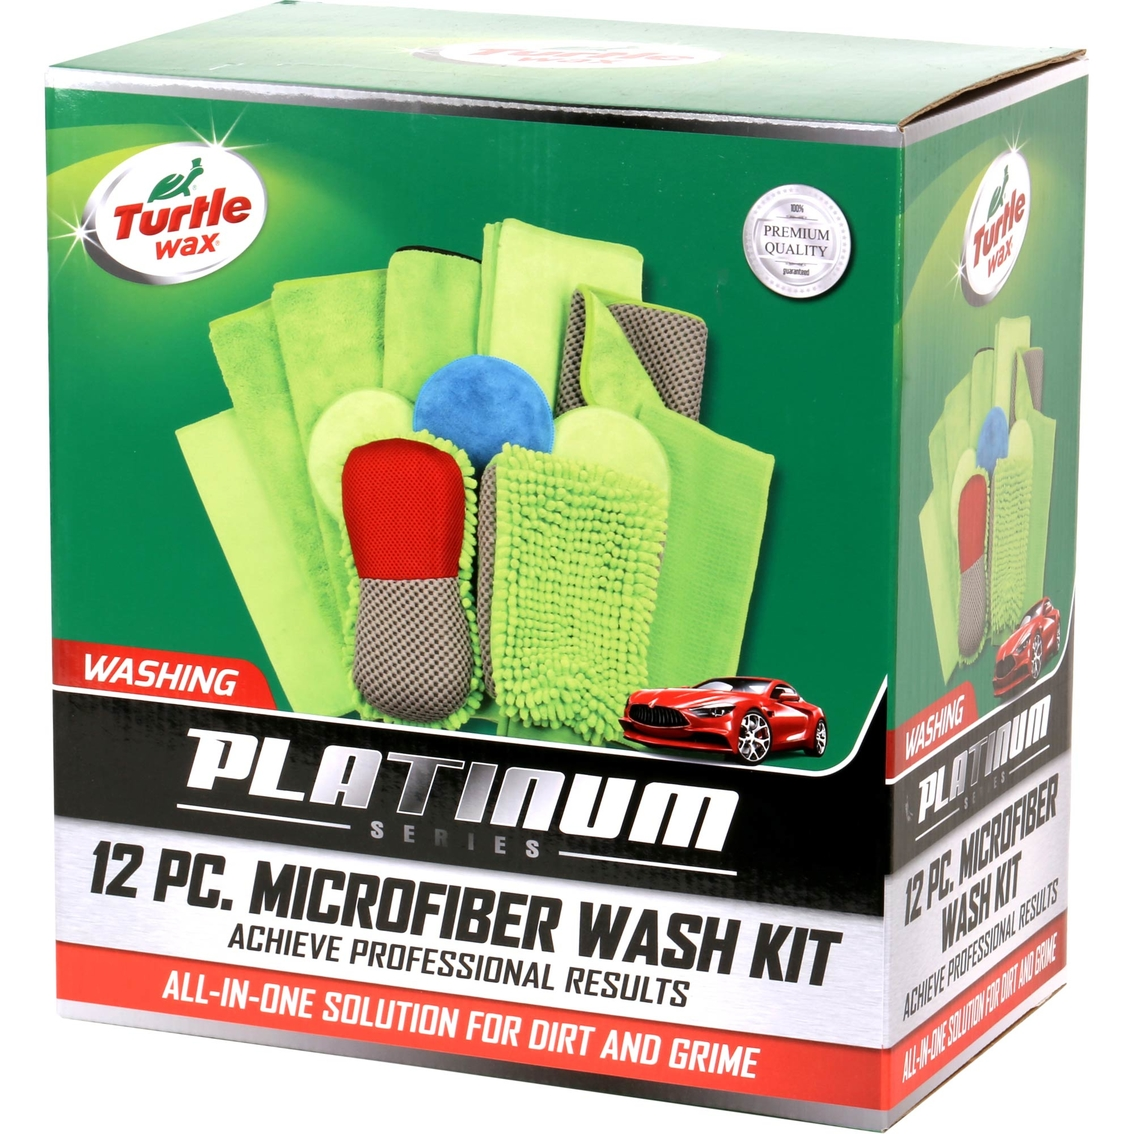 Turtle Wax Platinum 12 Pc Microfiber Car Wash Kit Care Cleaning